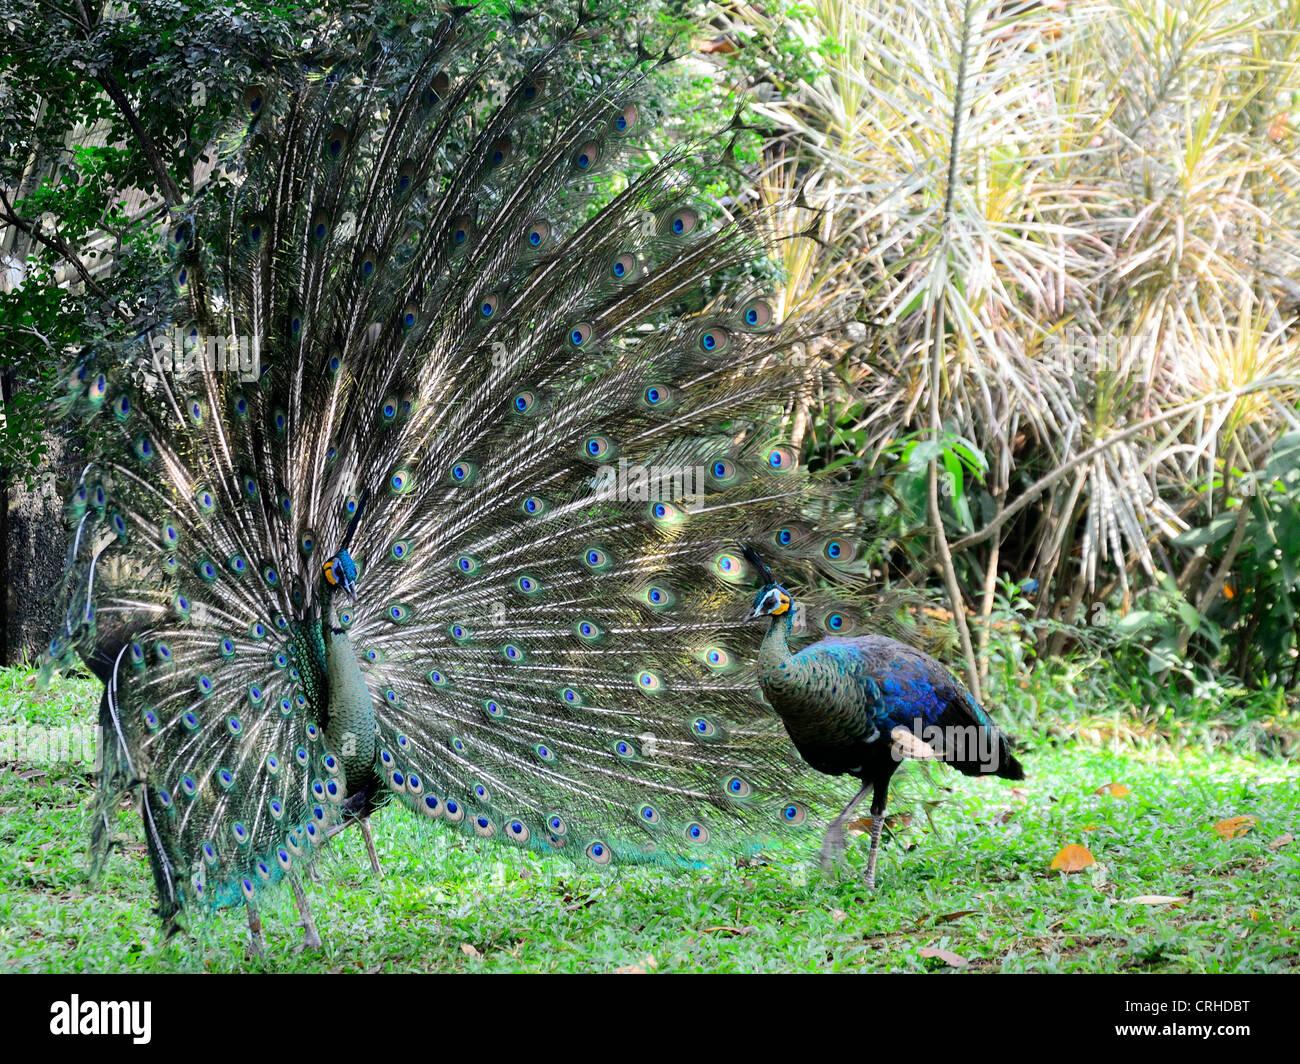 2 Peacock birds - Stock Image